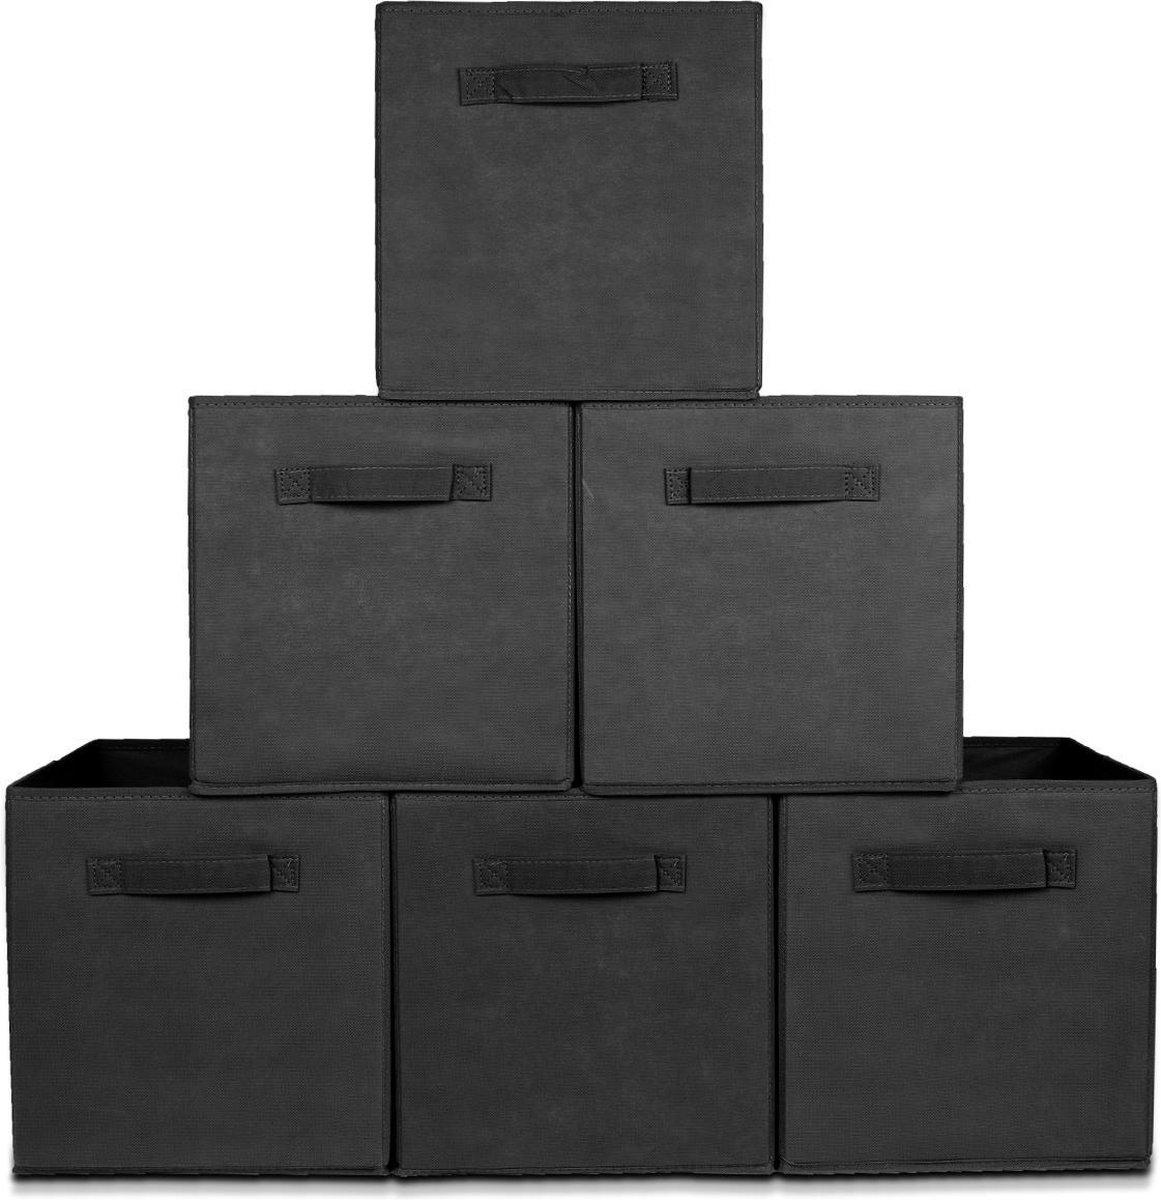 LifeGoods Kast Organizers - Set: 6 Stuks - Multifunctioneel Opberg Box/Doos/Mand/Vakken - Opbergsyst